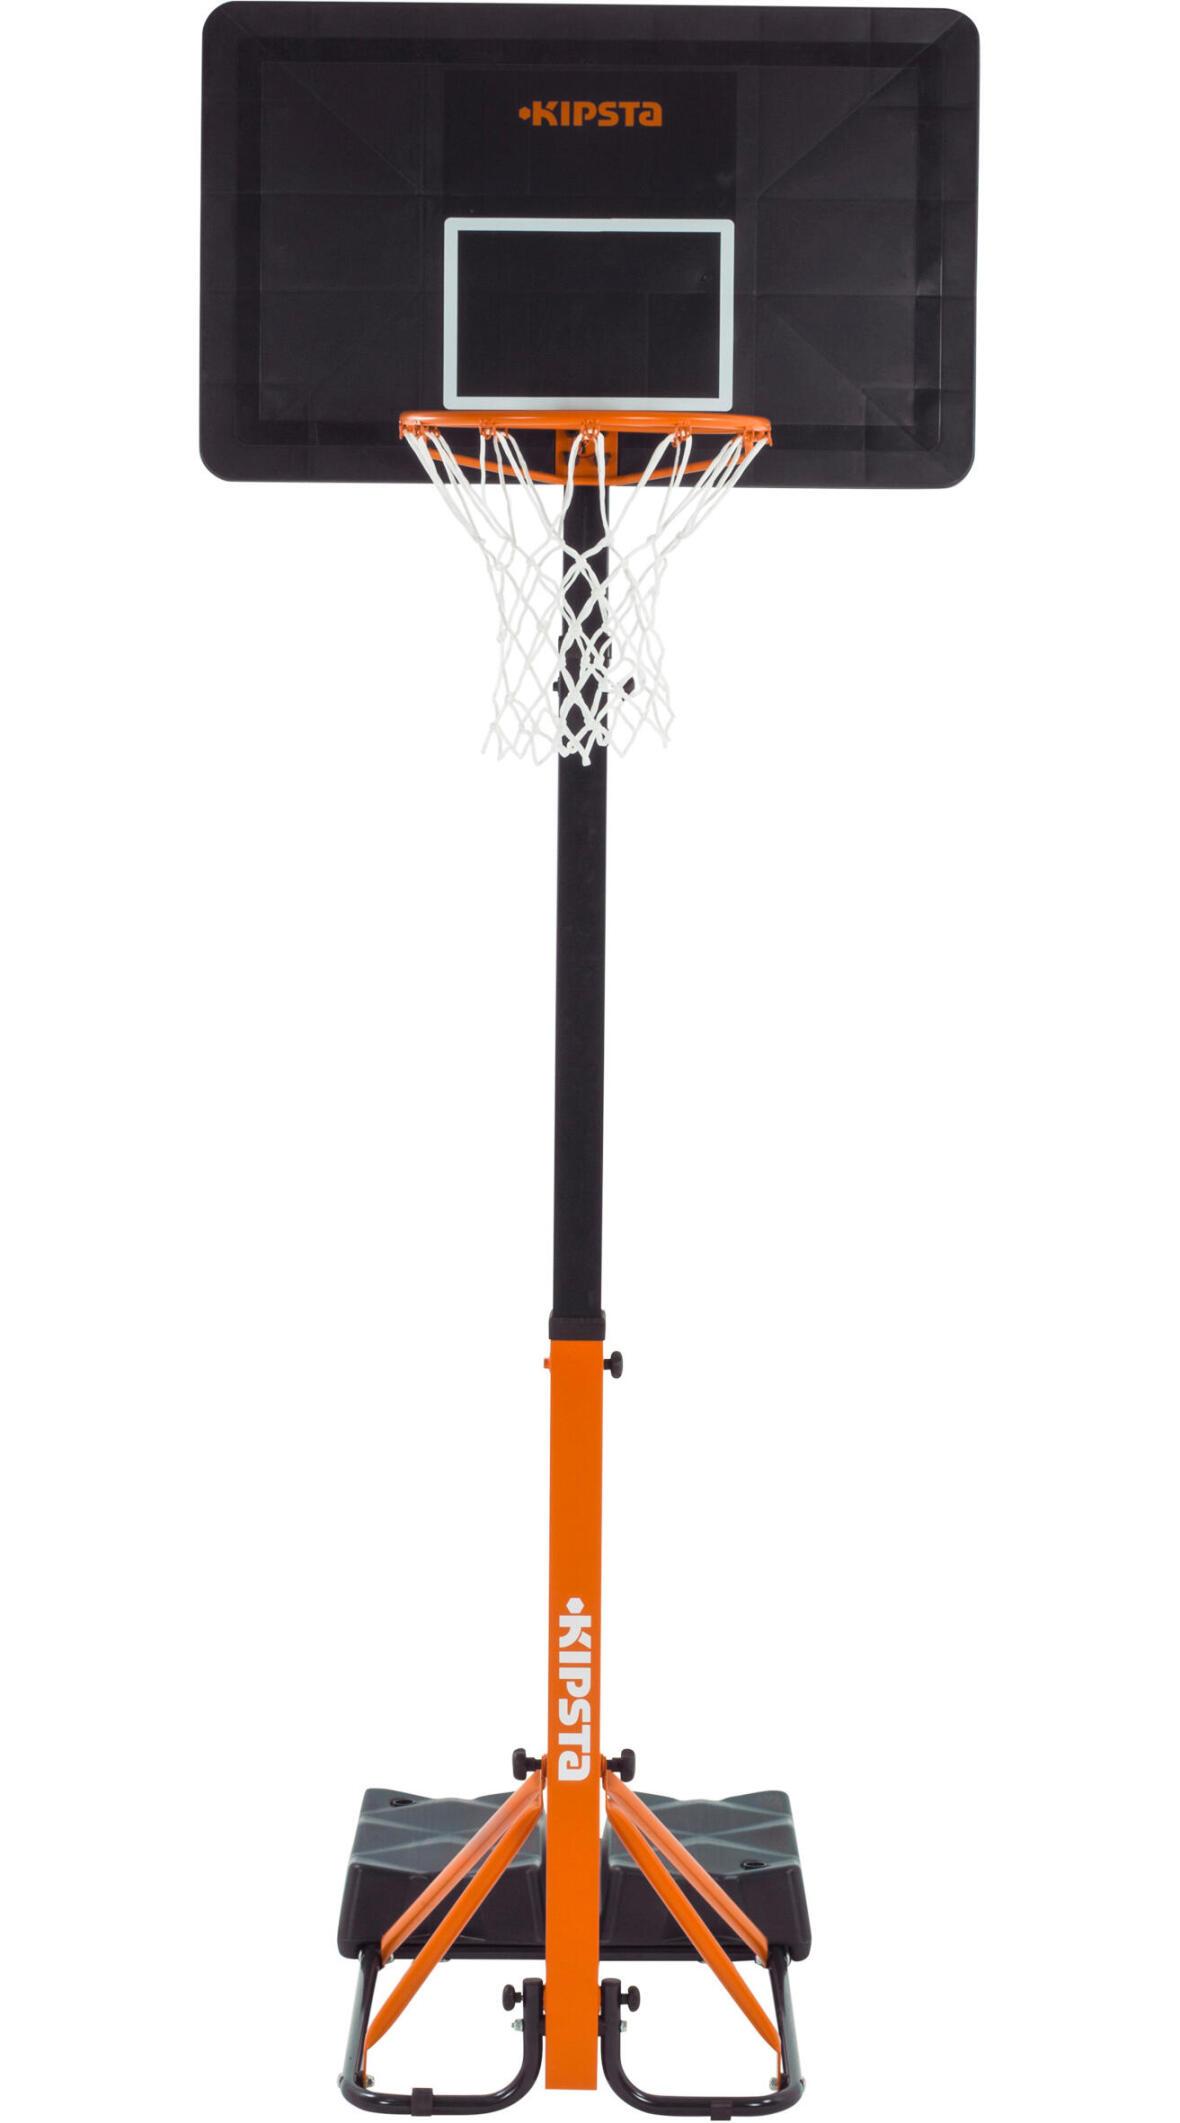 tabela-de-basquetebol-b-400-decathlon-tarmak